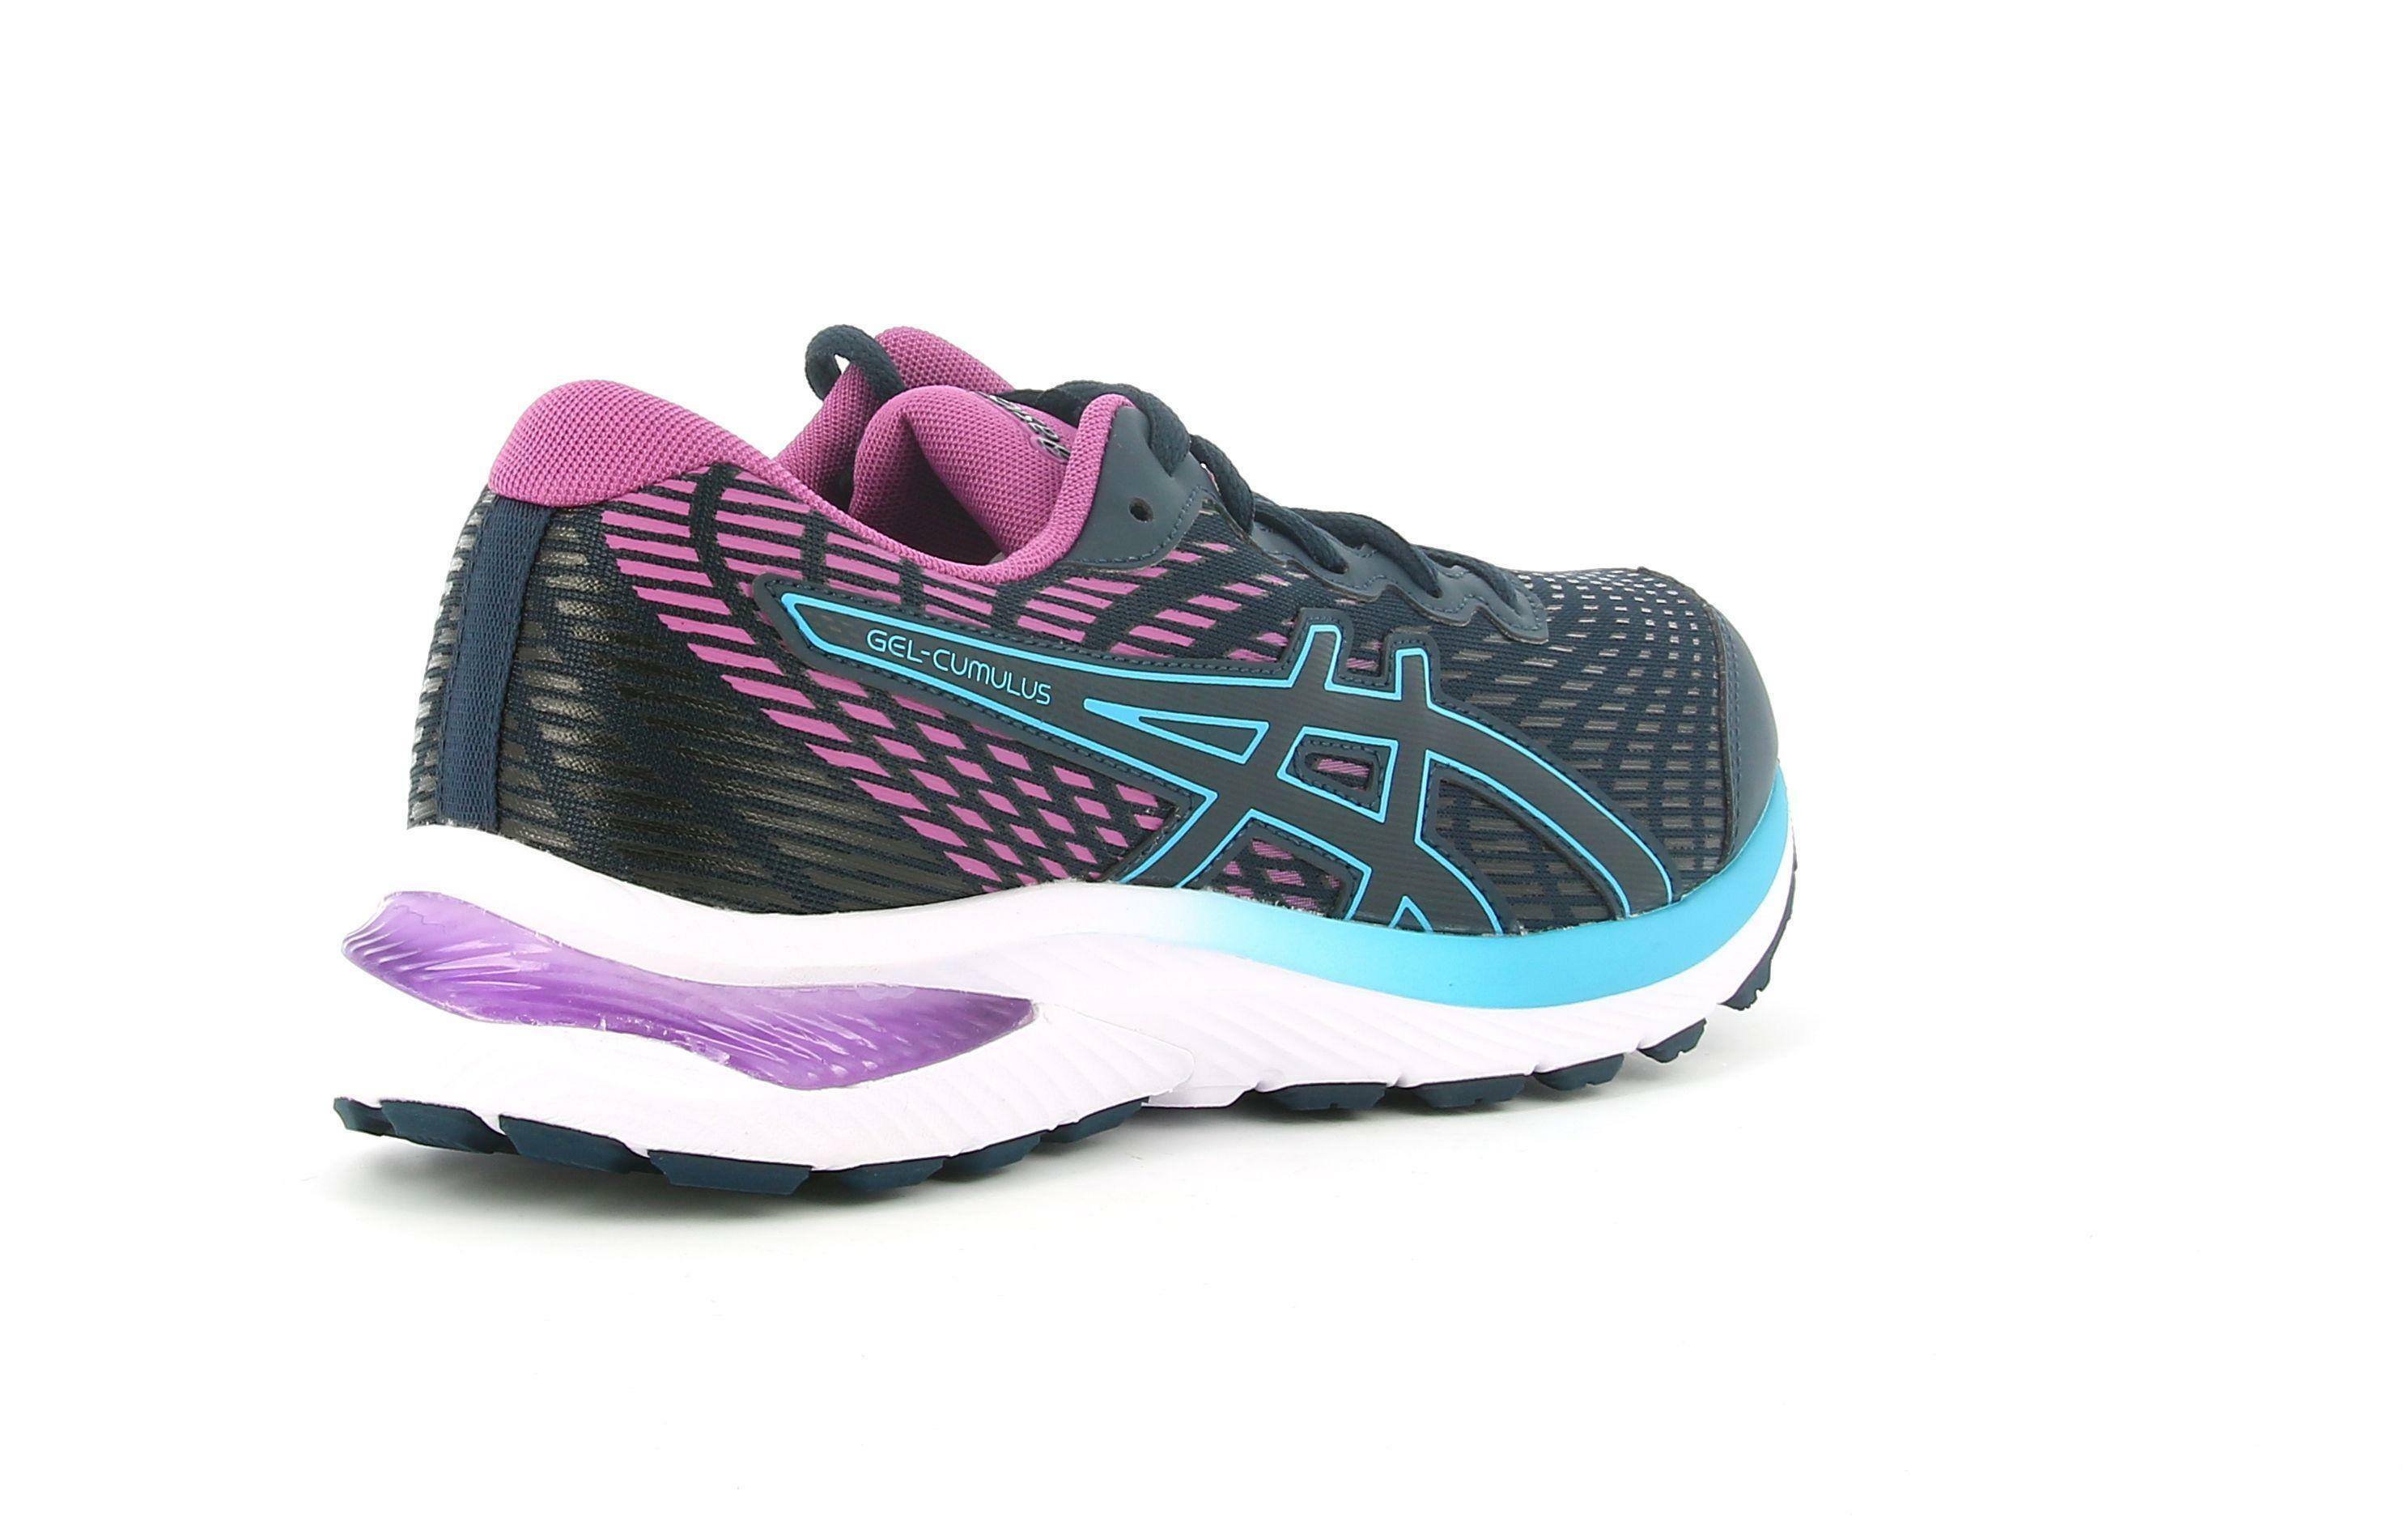 asics asics 1014a148-404 gel comulus 22 gs blue/grape scarpe da corsa